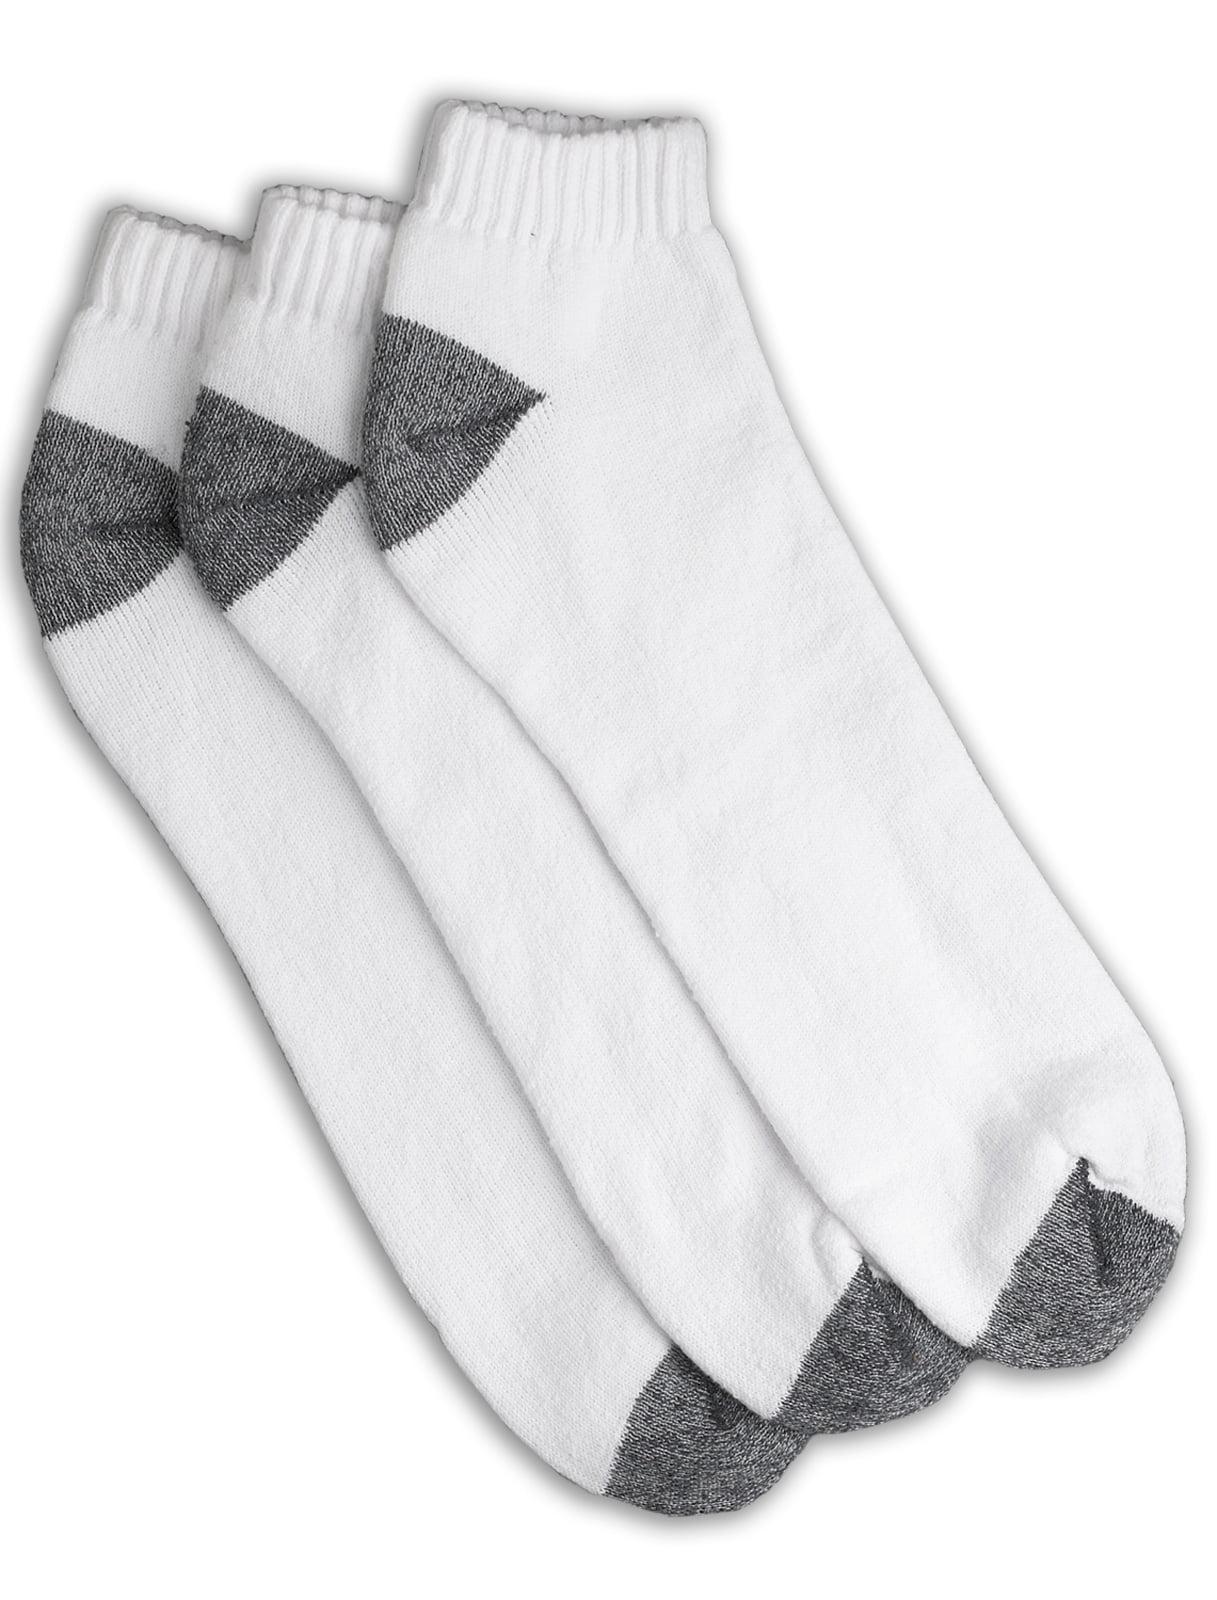 Men's Big & Tall Harbor Bay 3-pk Continuous Comfort Low Cut Socks